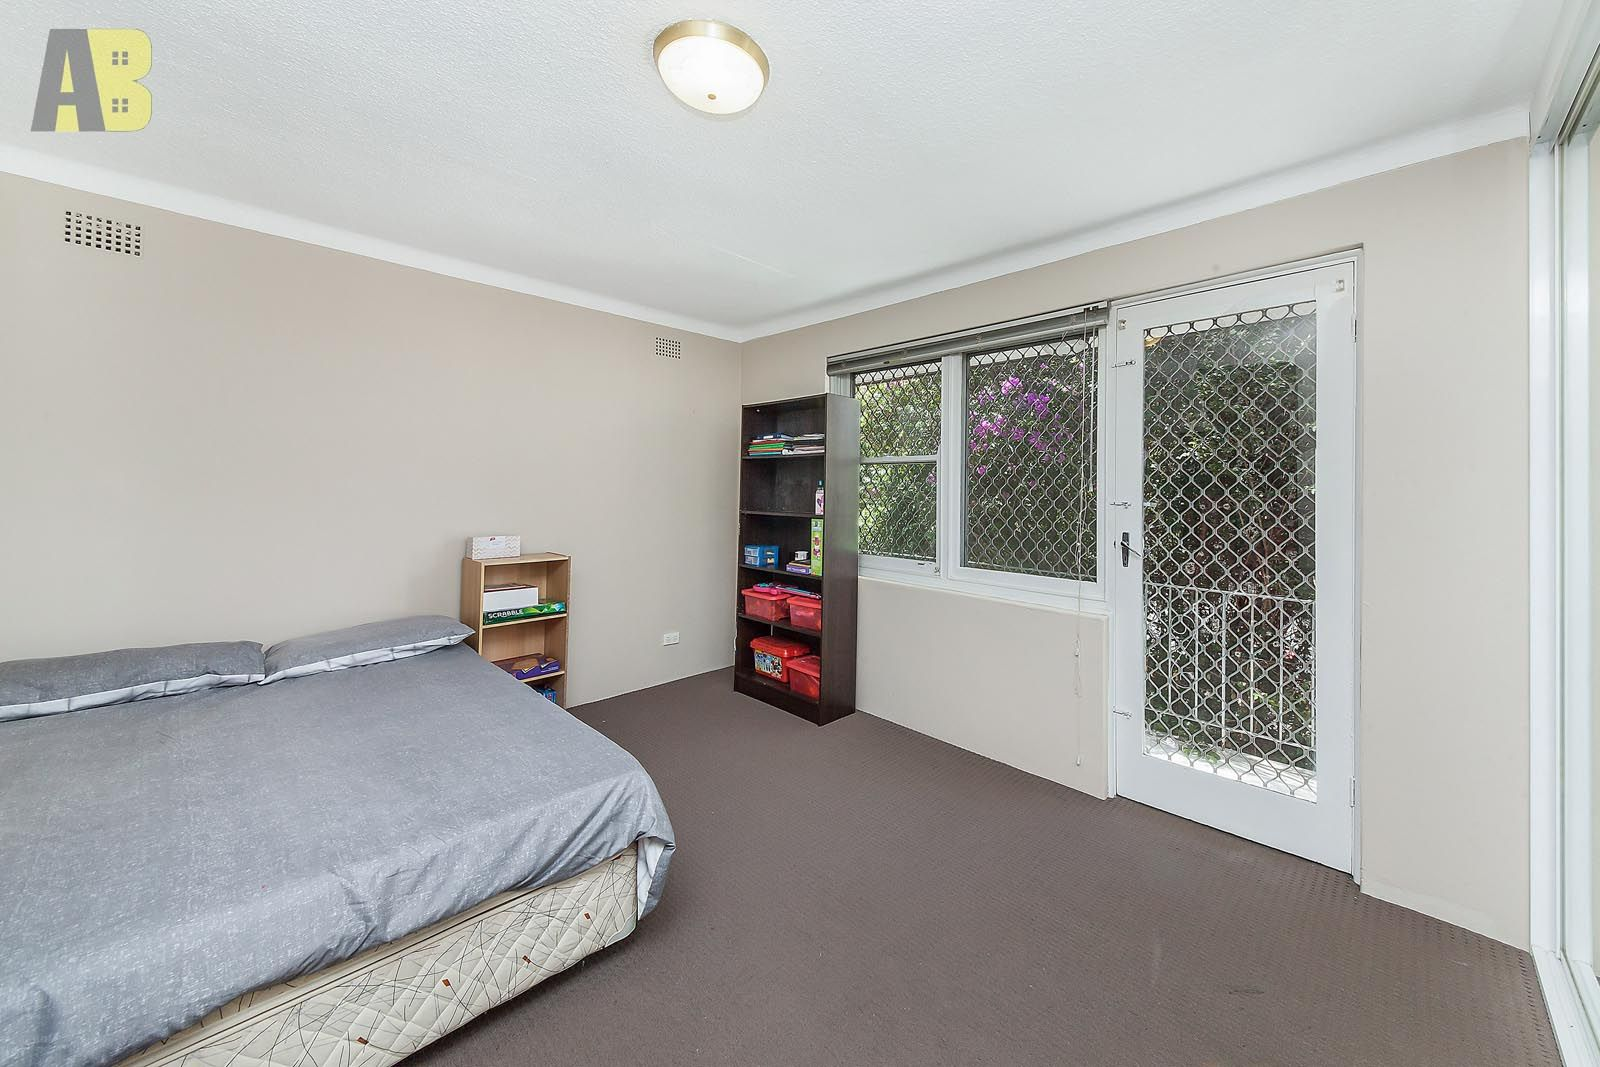 5/10 ALLEN STREET, Harris Park NSW 2150, Image 2